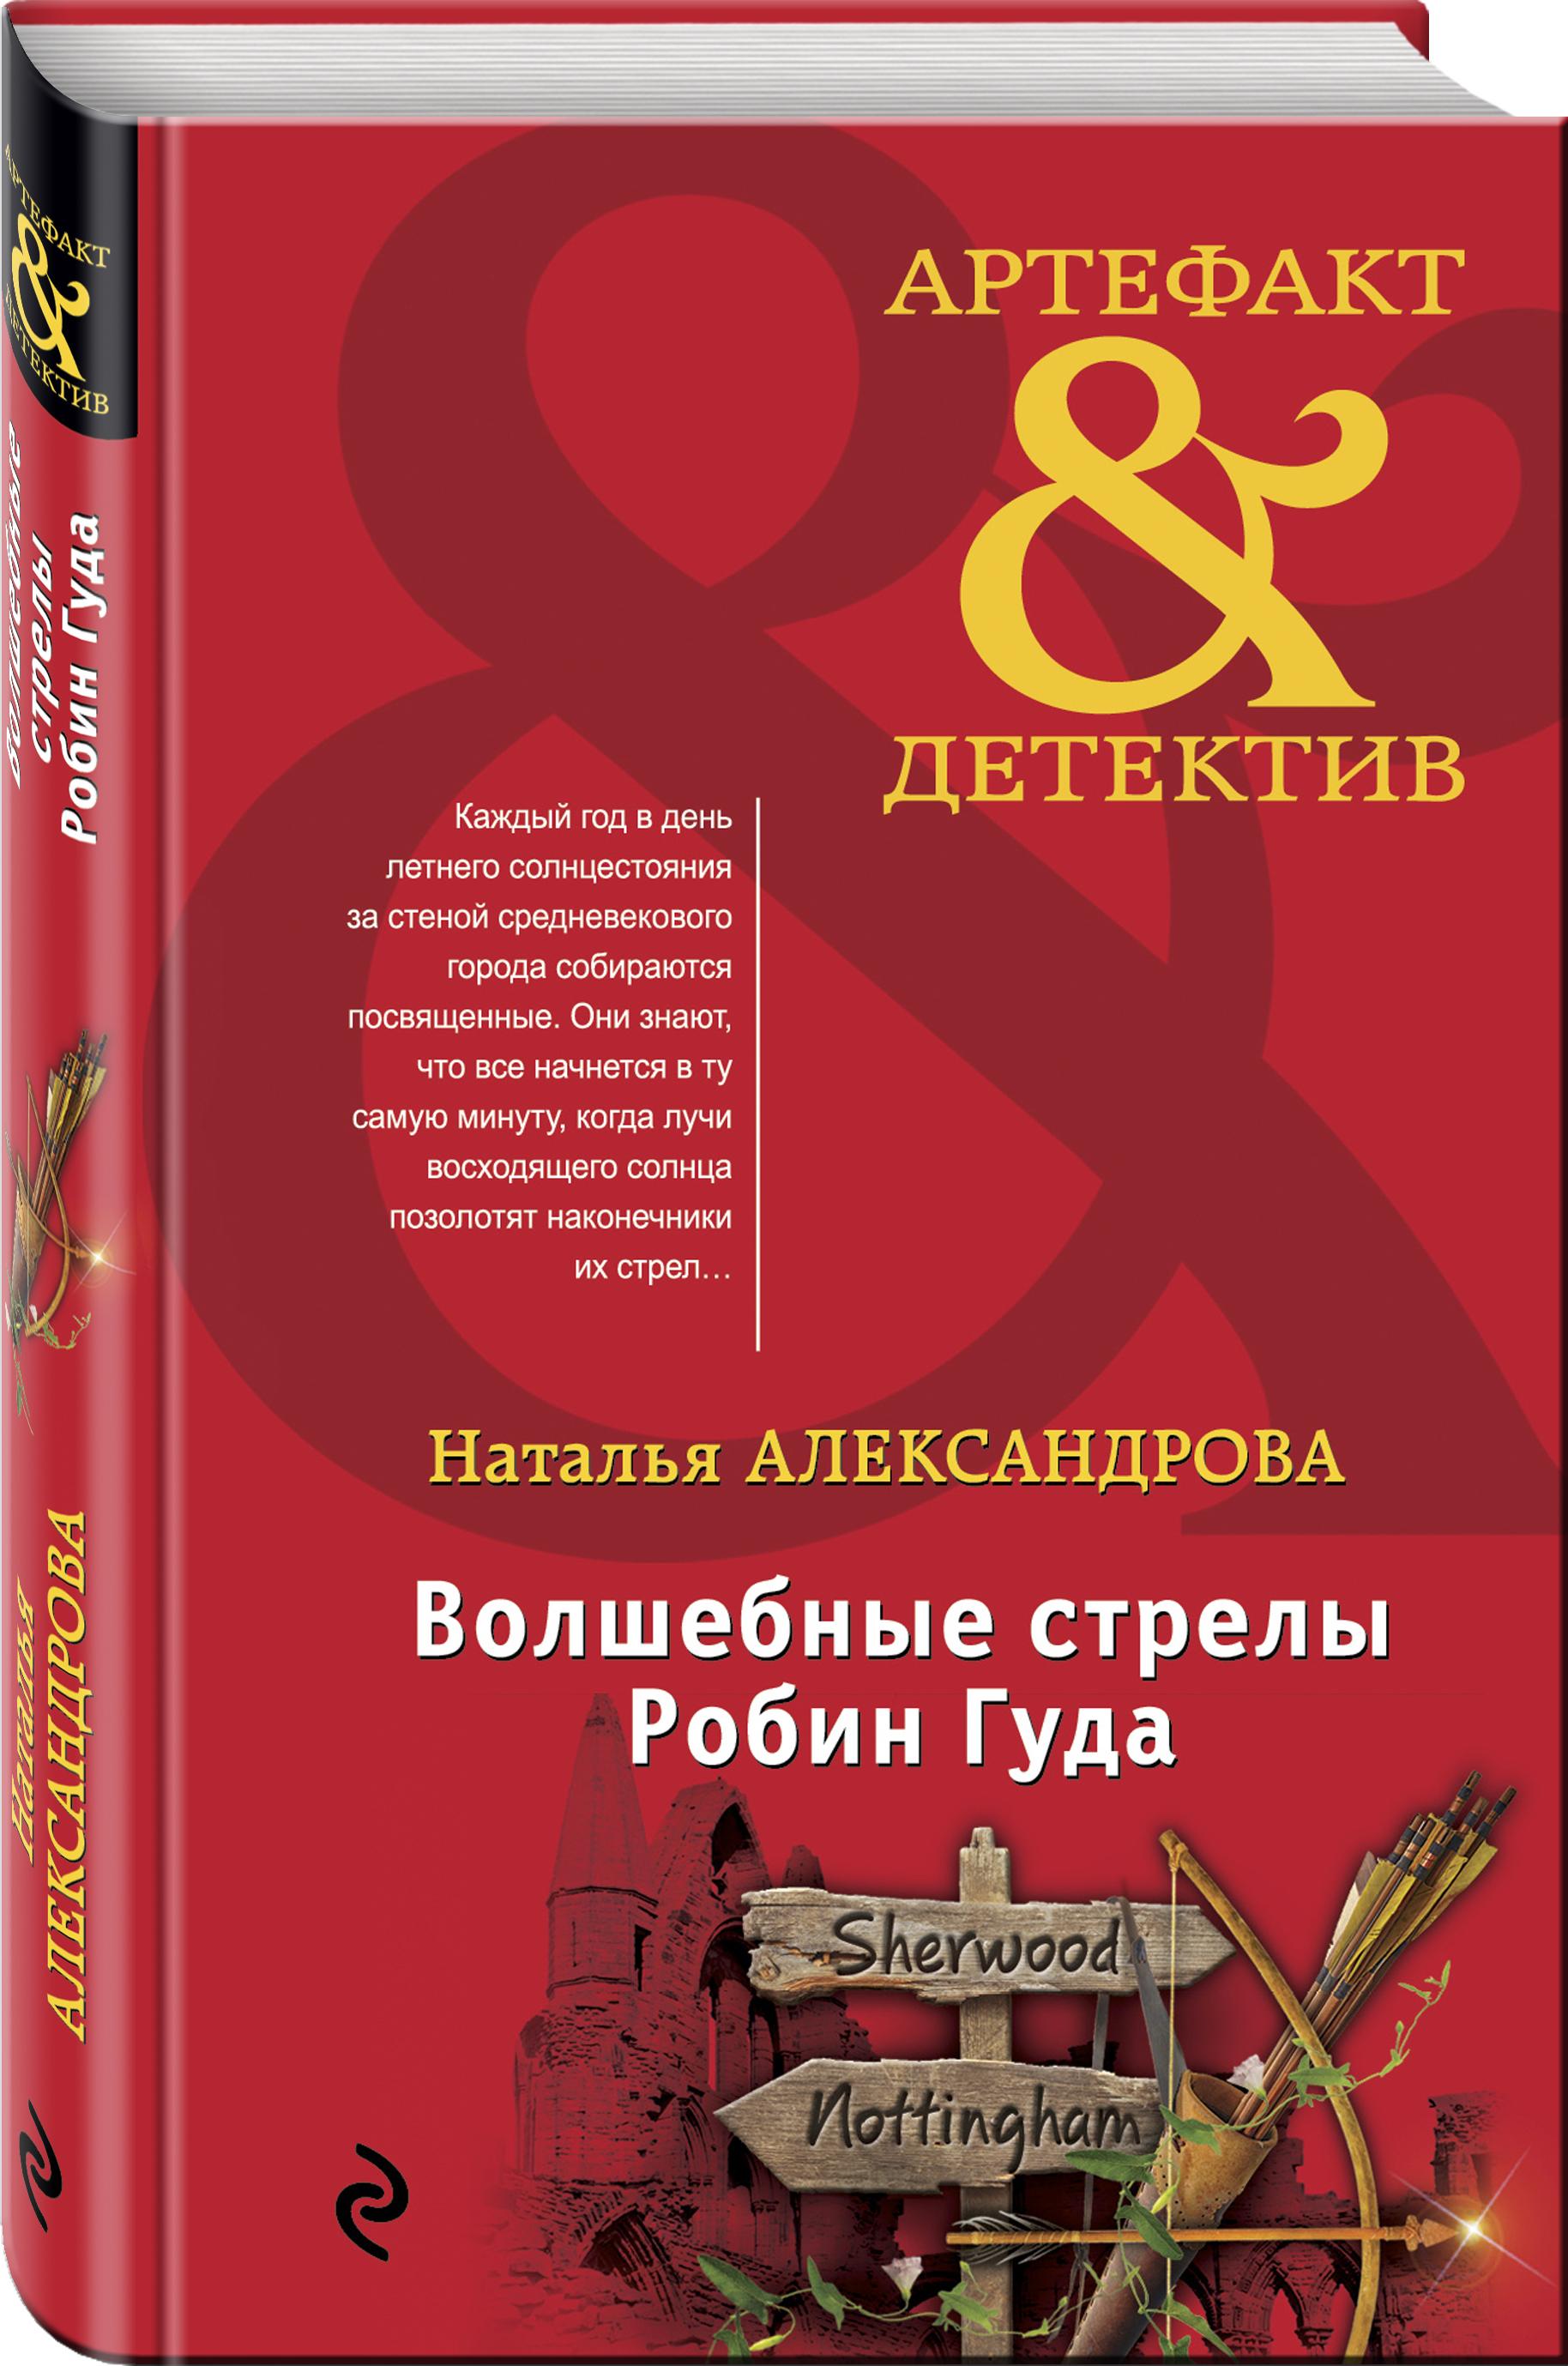 Наталья Александрова Волшебные стрелы Робин Гуда